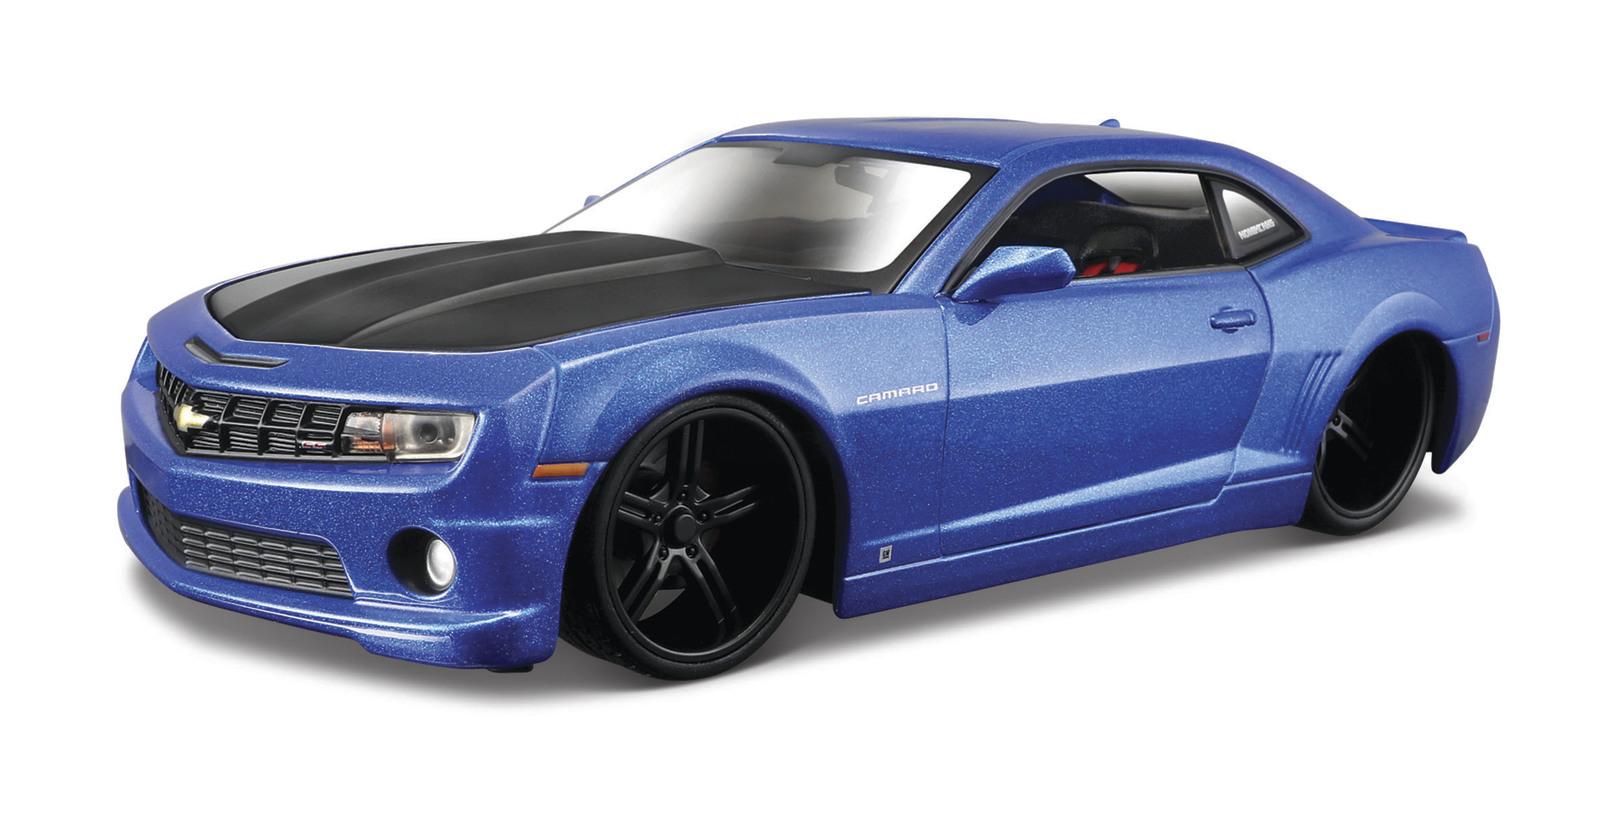 Maisto Design: 1:24 Diecast Vehicle - 2010 Chevrolet Camaro SS RS Blue With Black Hood image